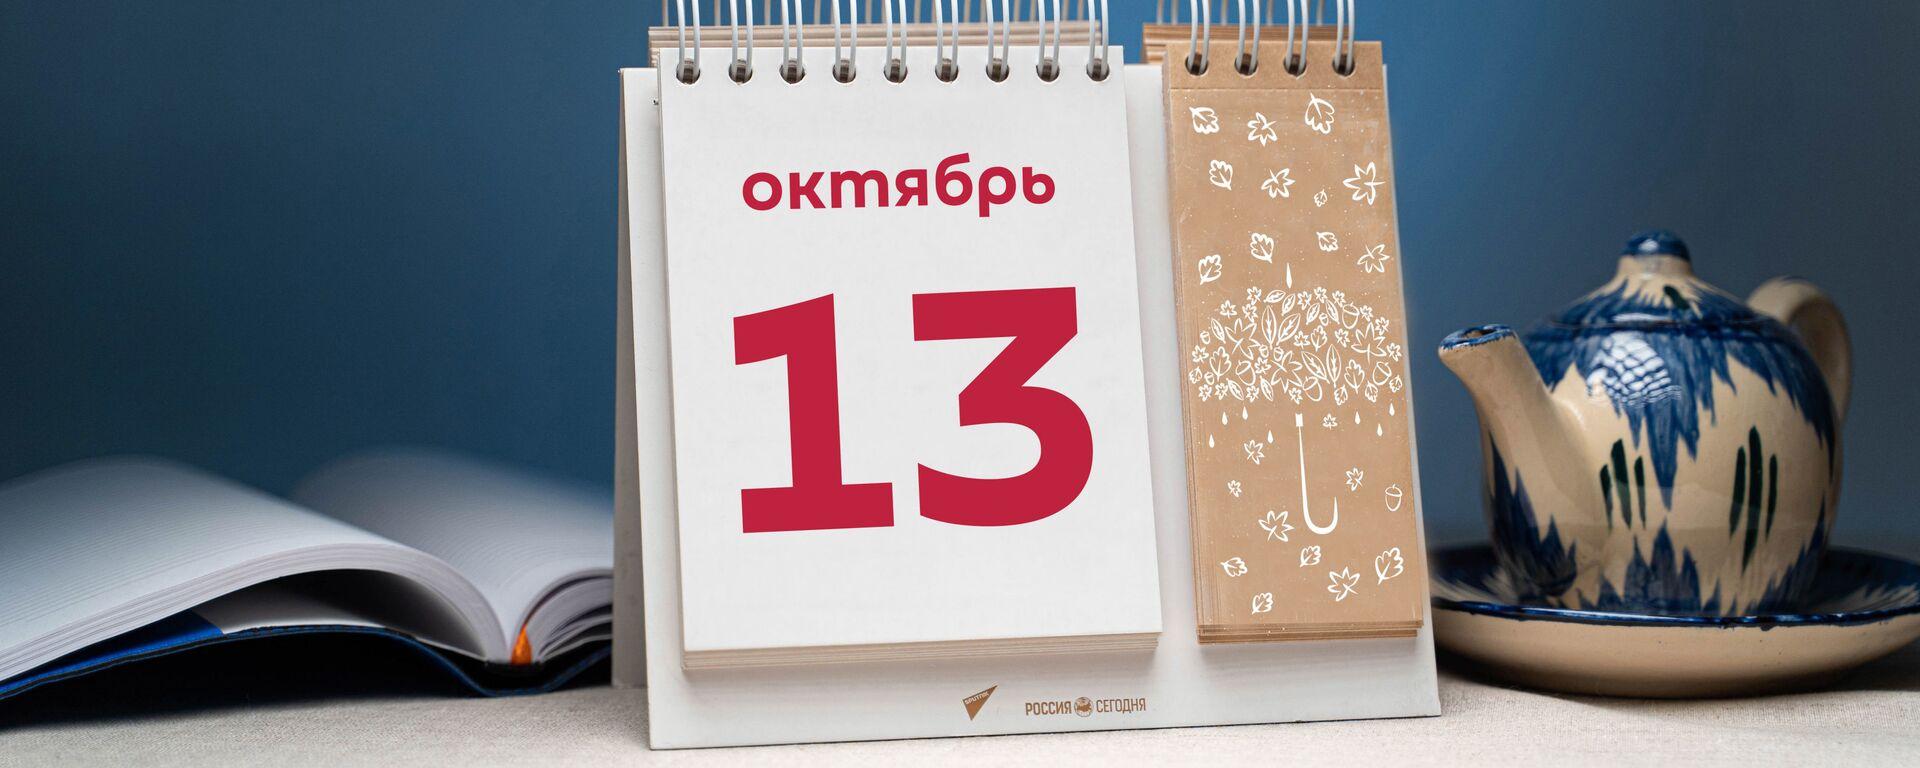 День 13 октября - Sputnik Тоҷикистон, 1920, 13.10.2021